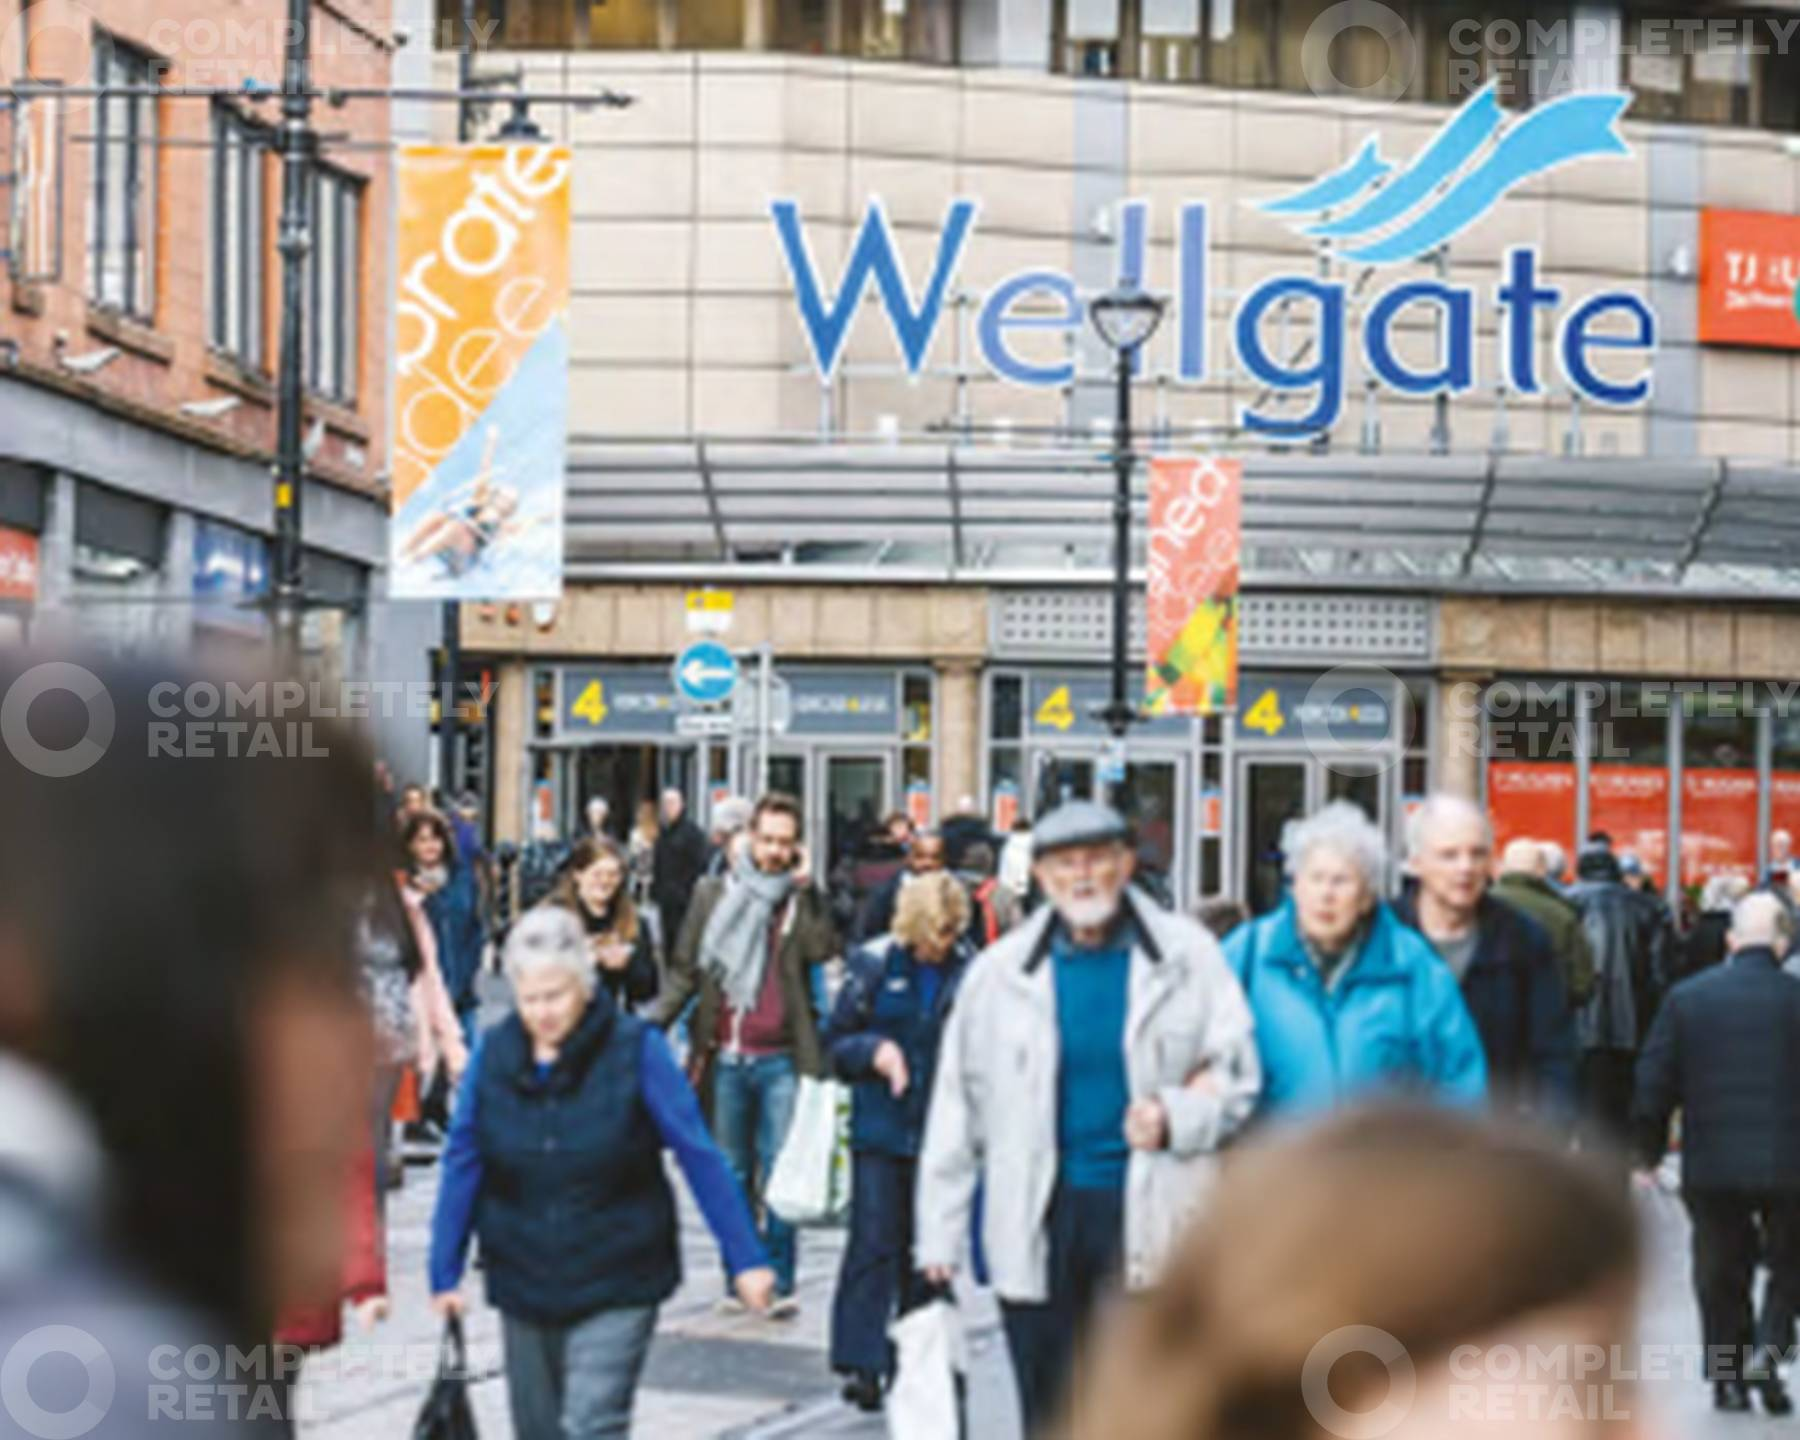 Wellgate Shopping Centre